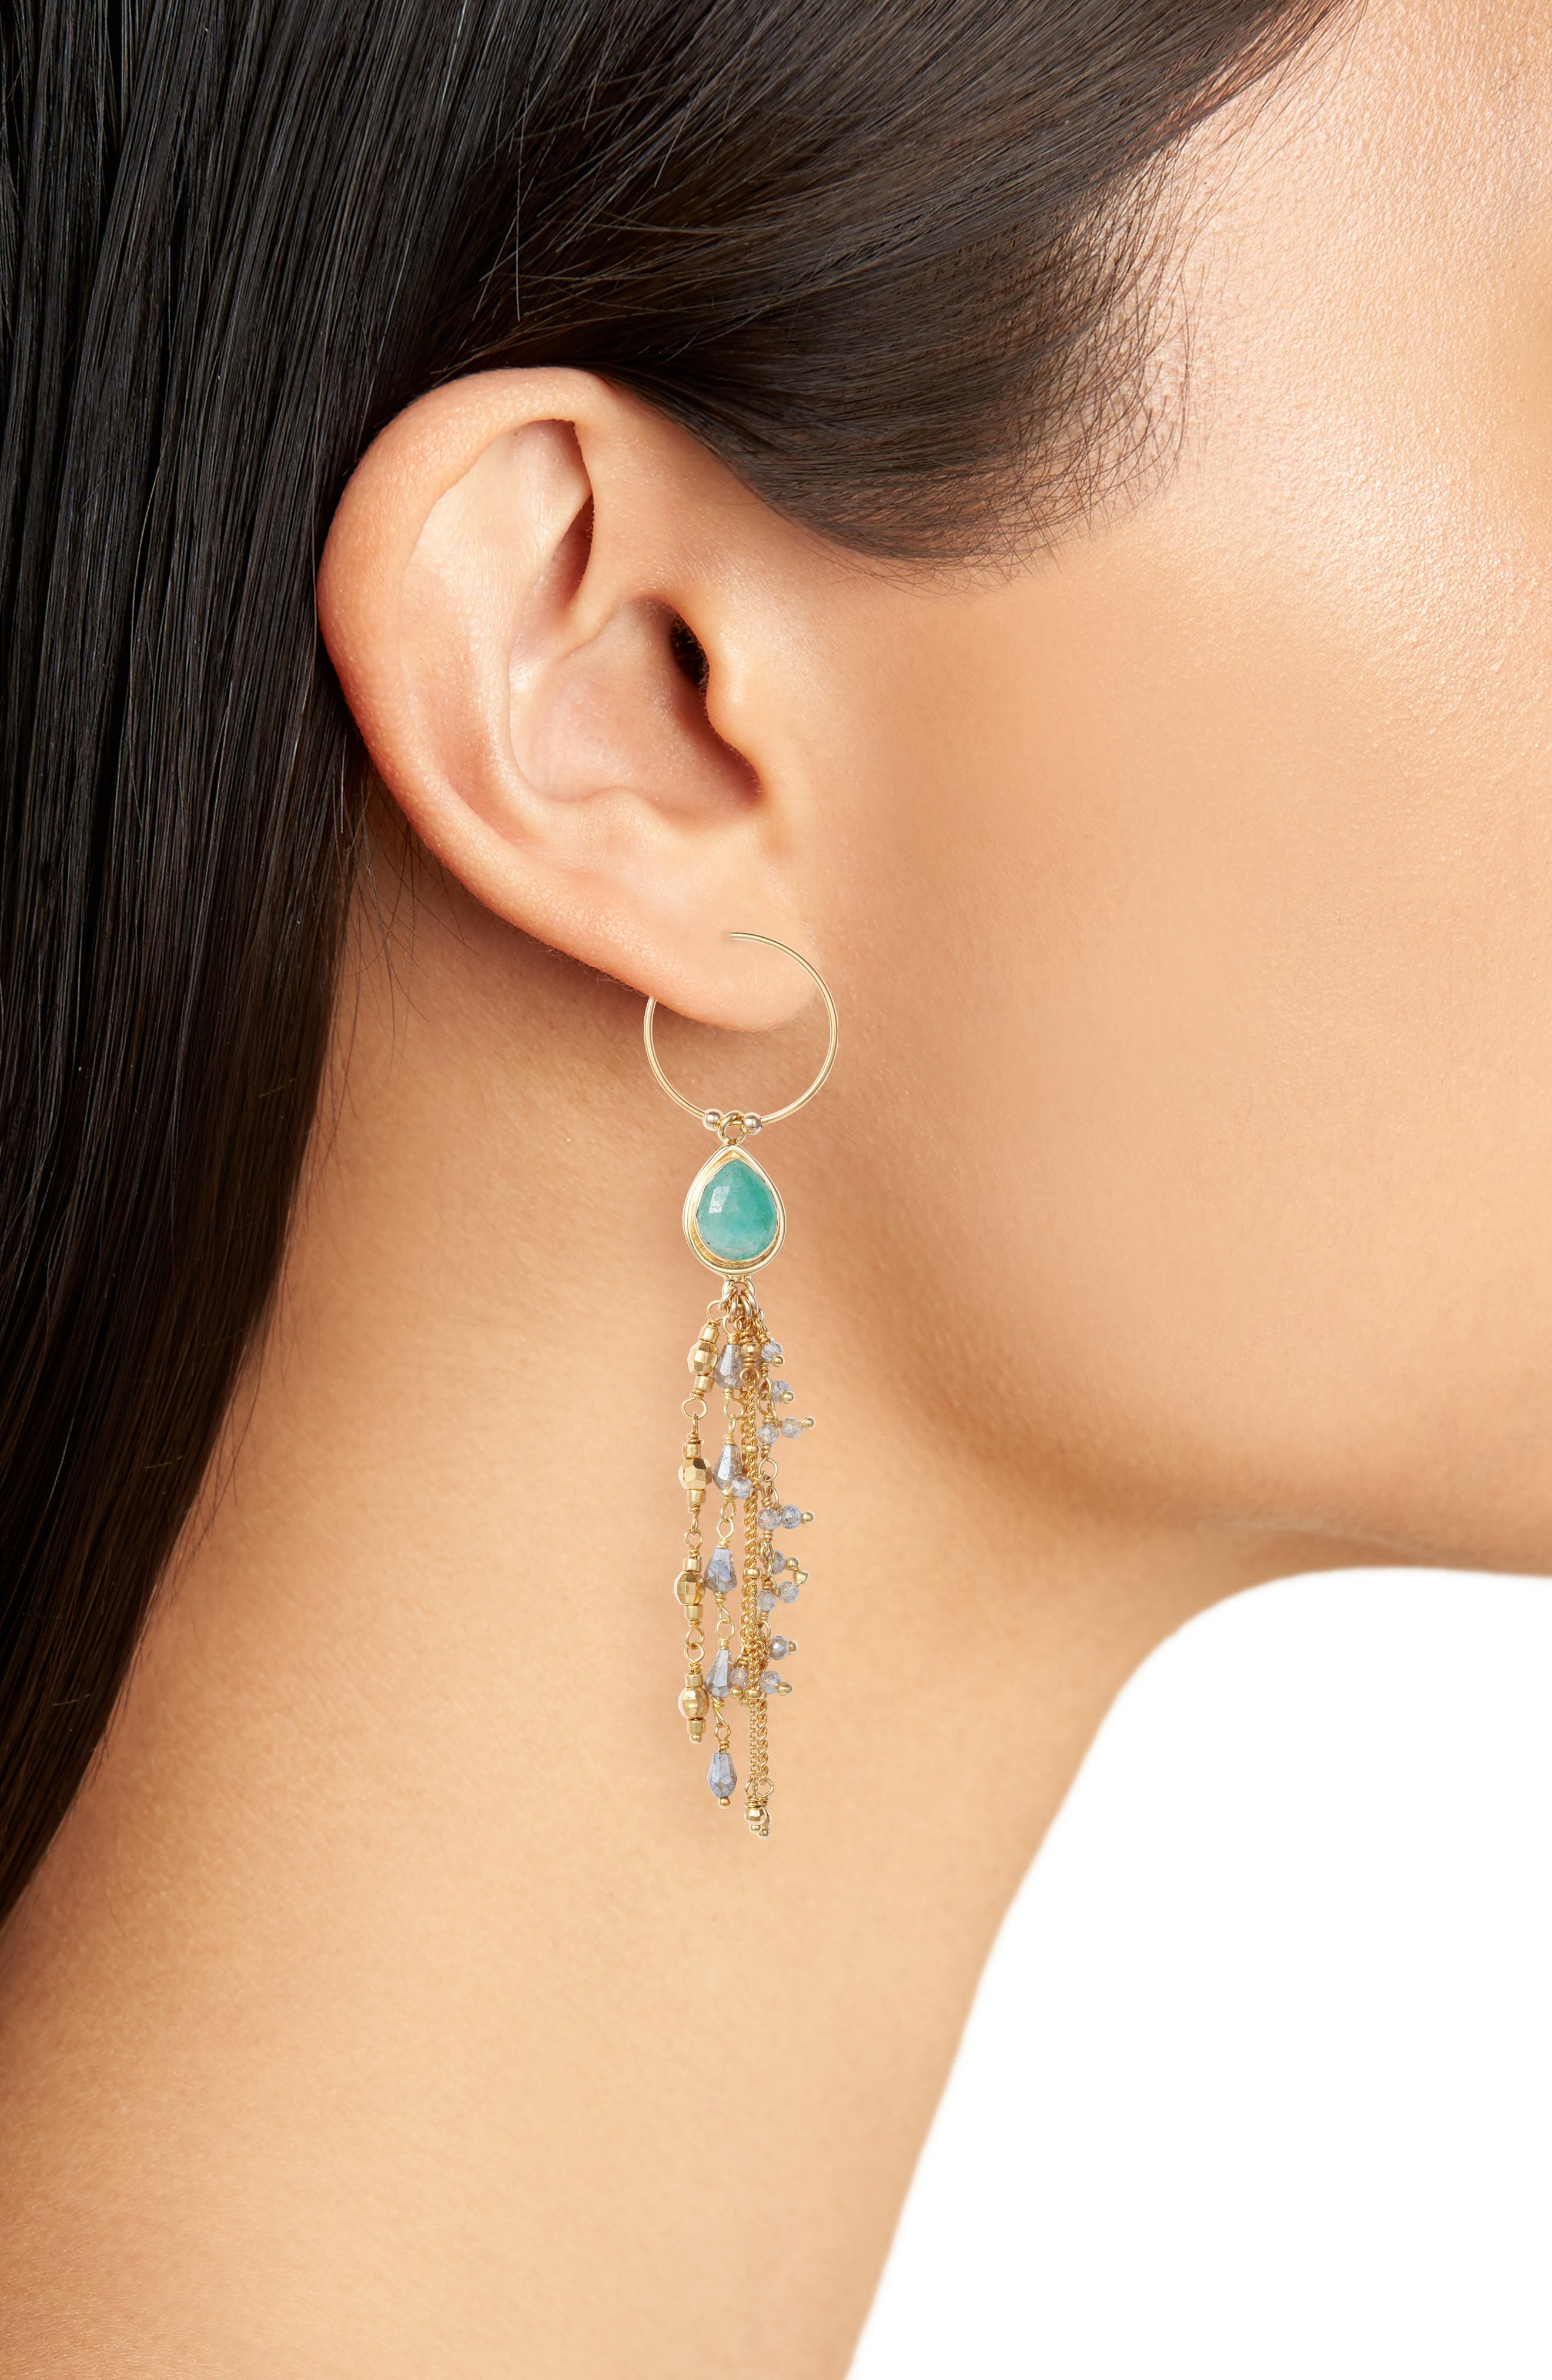 Moonstone Chain Earrings,                             Alternate thumbnail 2, color,                             AMAZONITE